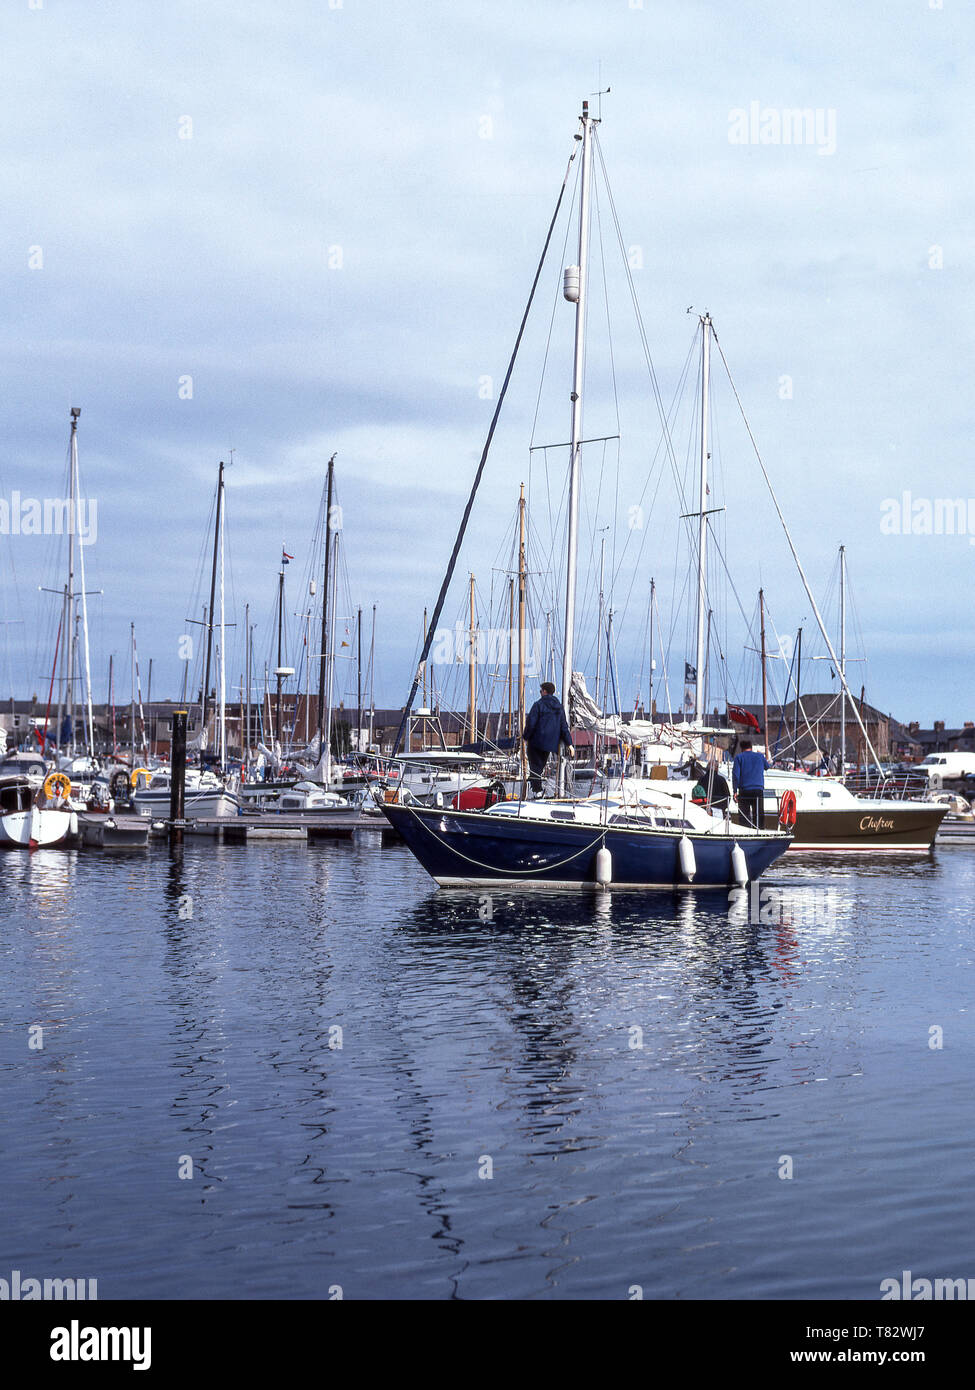 Amble harbour on the North Sea coast of Northumberland..England - Stock Image